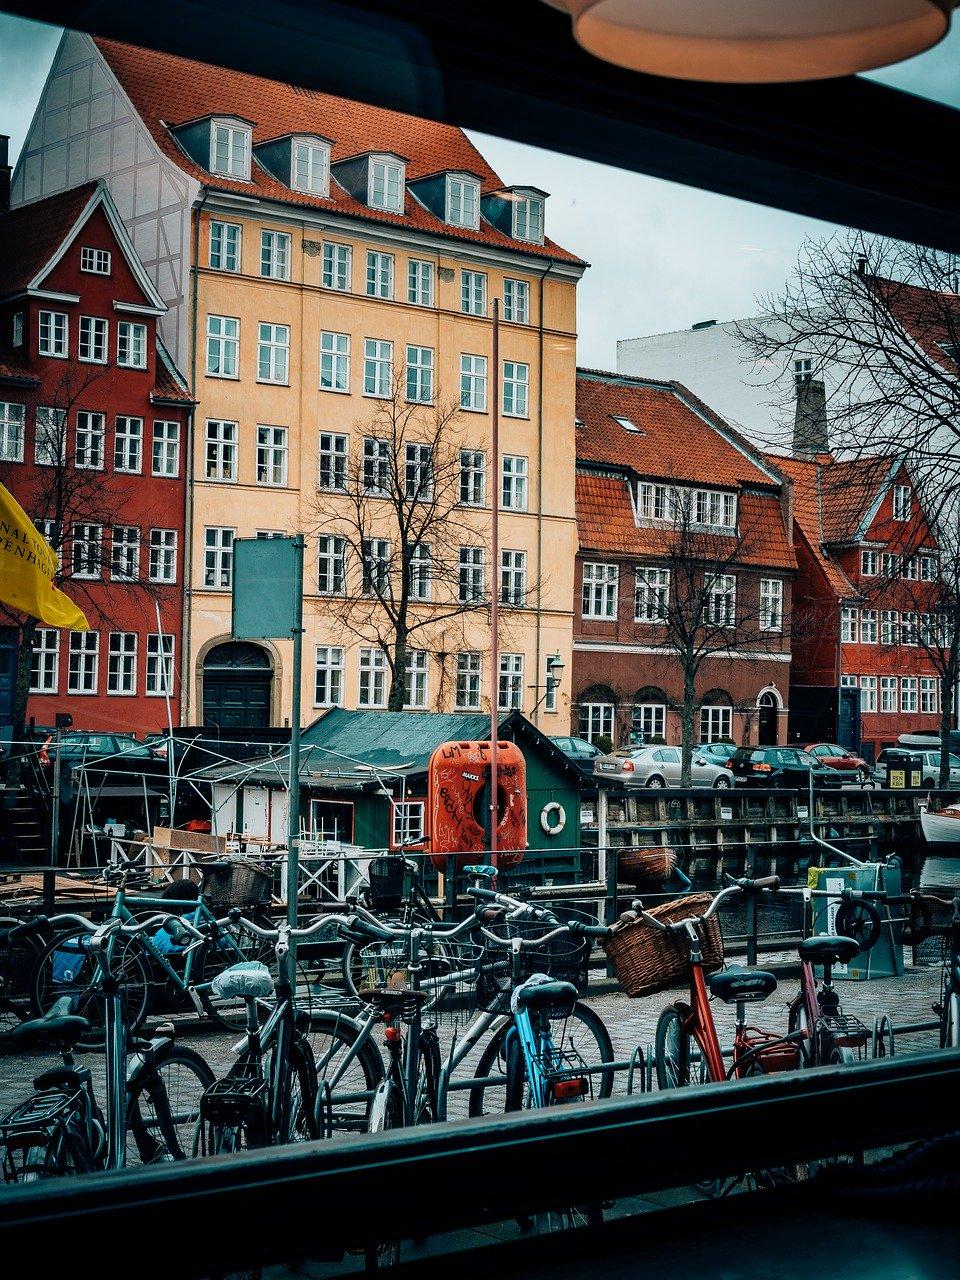 debt collection agency in Denmark